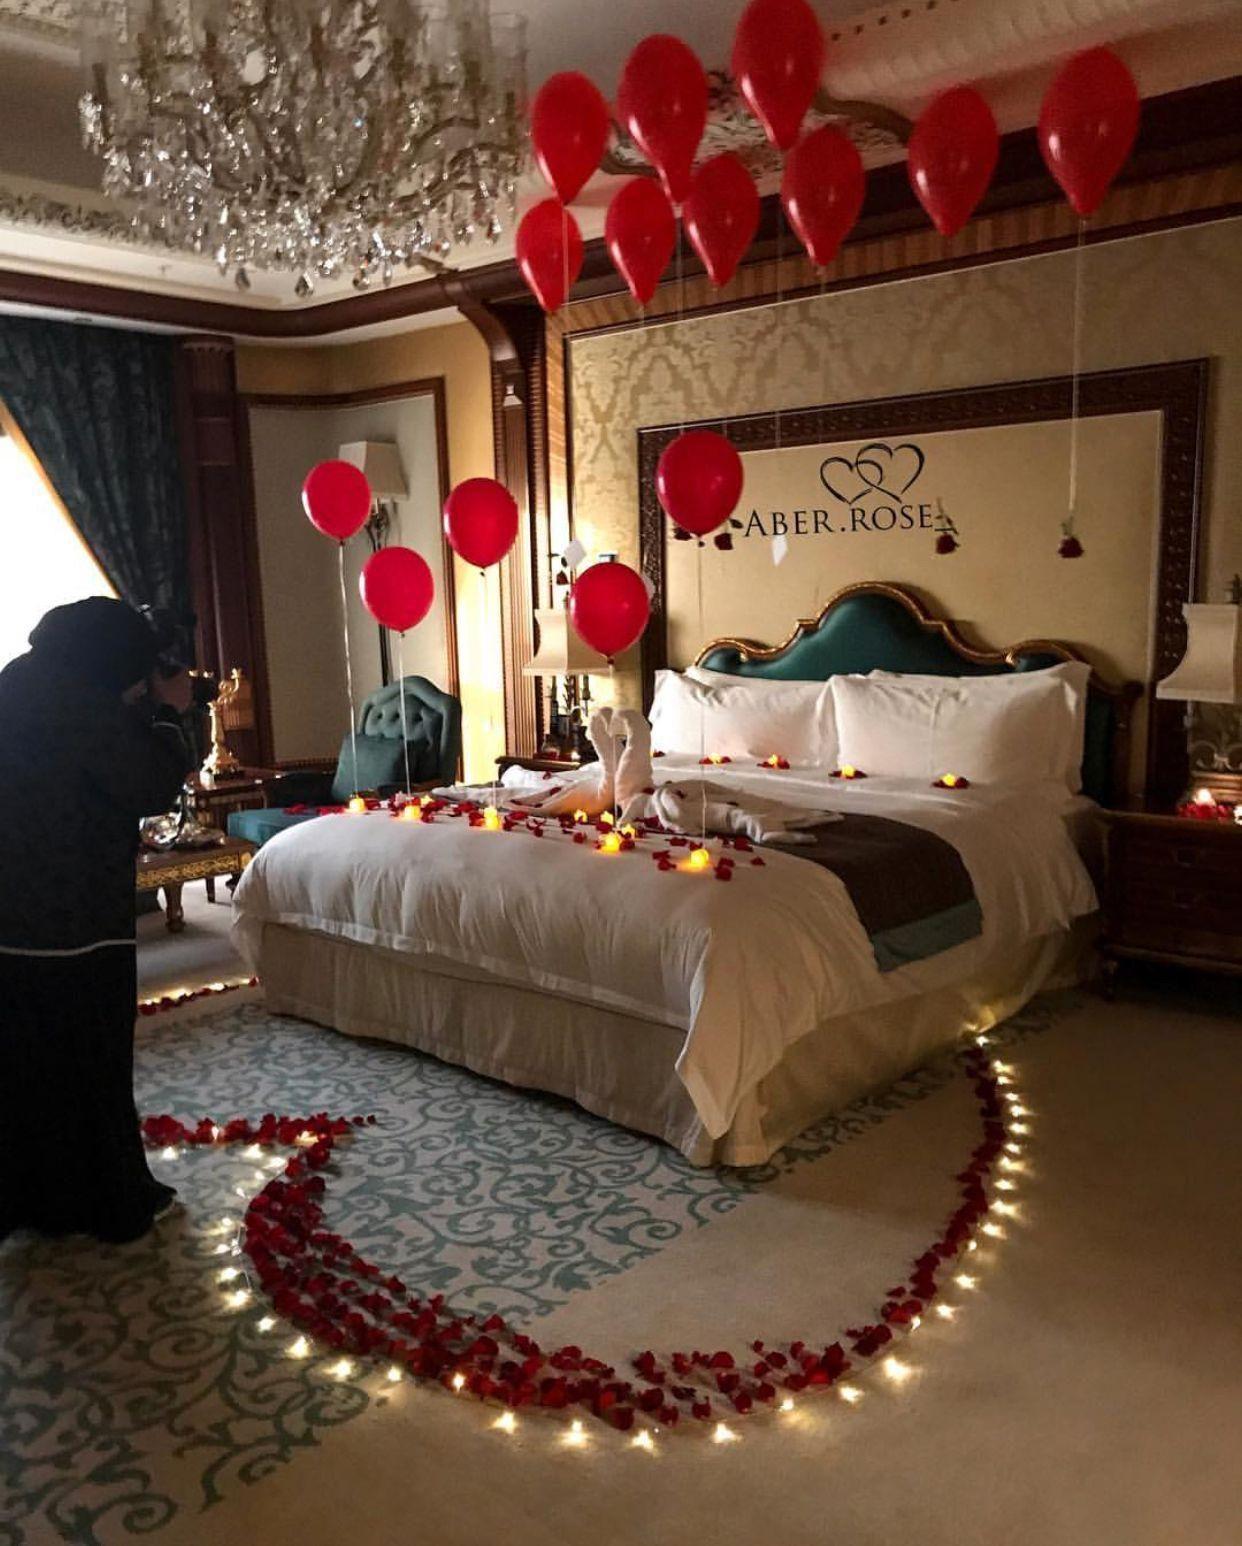 12 Deco Chambre Nuptiale   Romantic room surprise, Romantic hotel ...